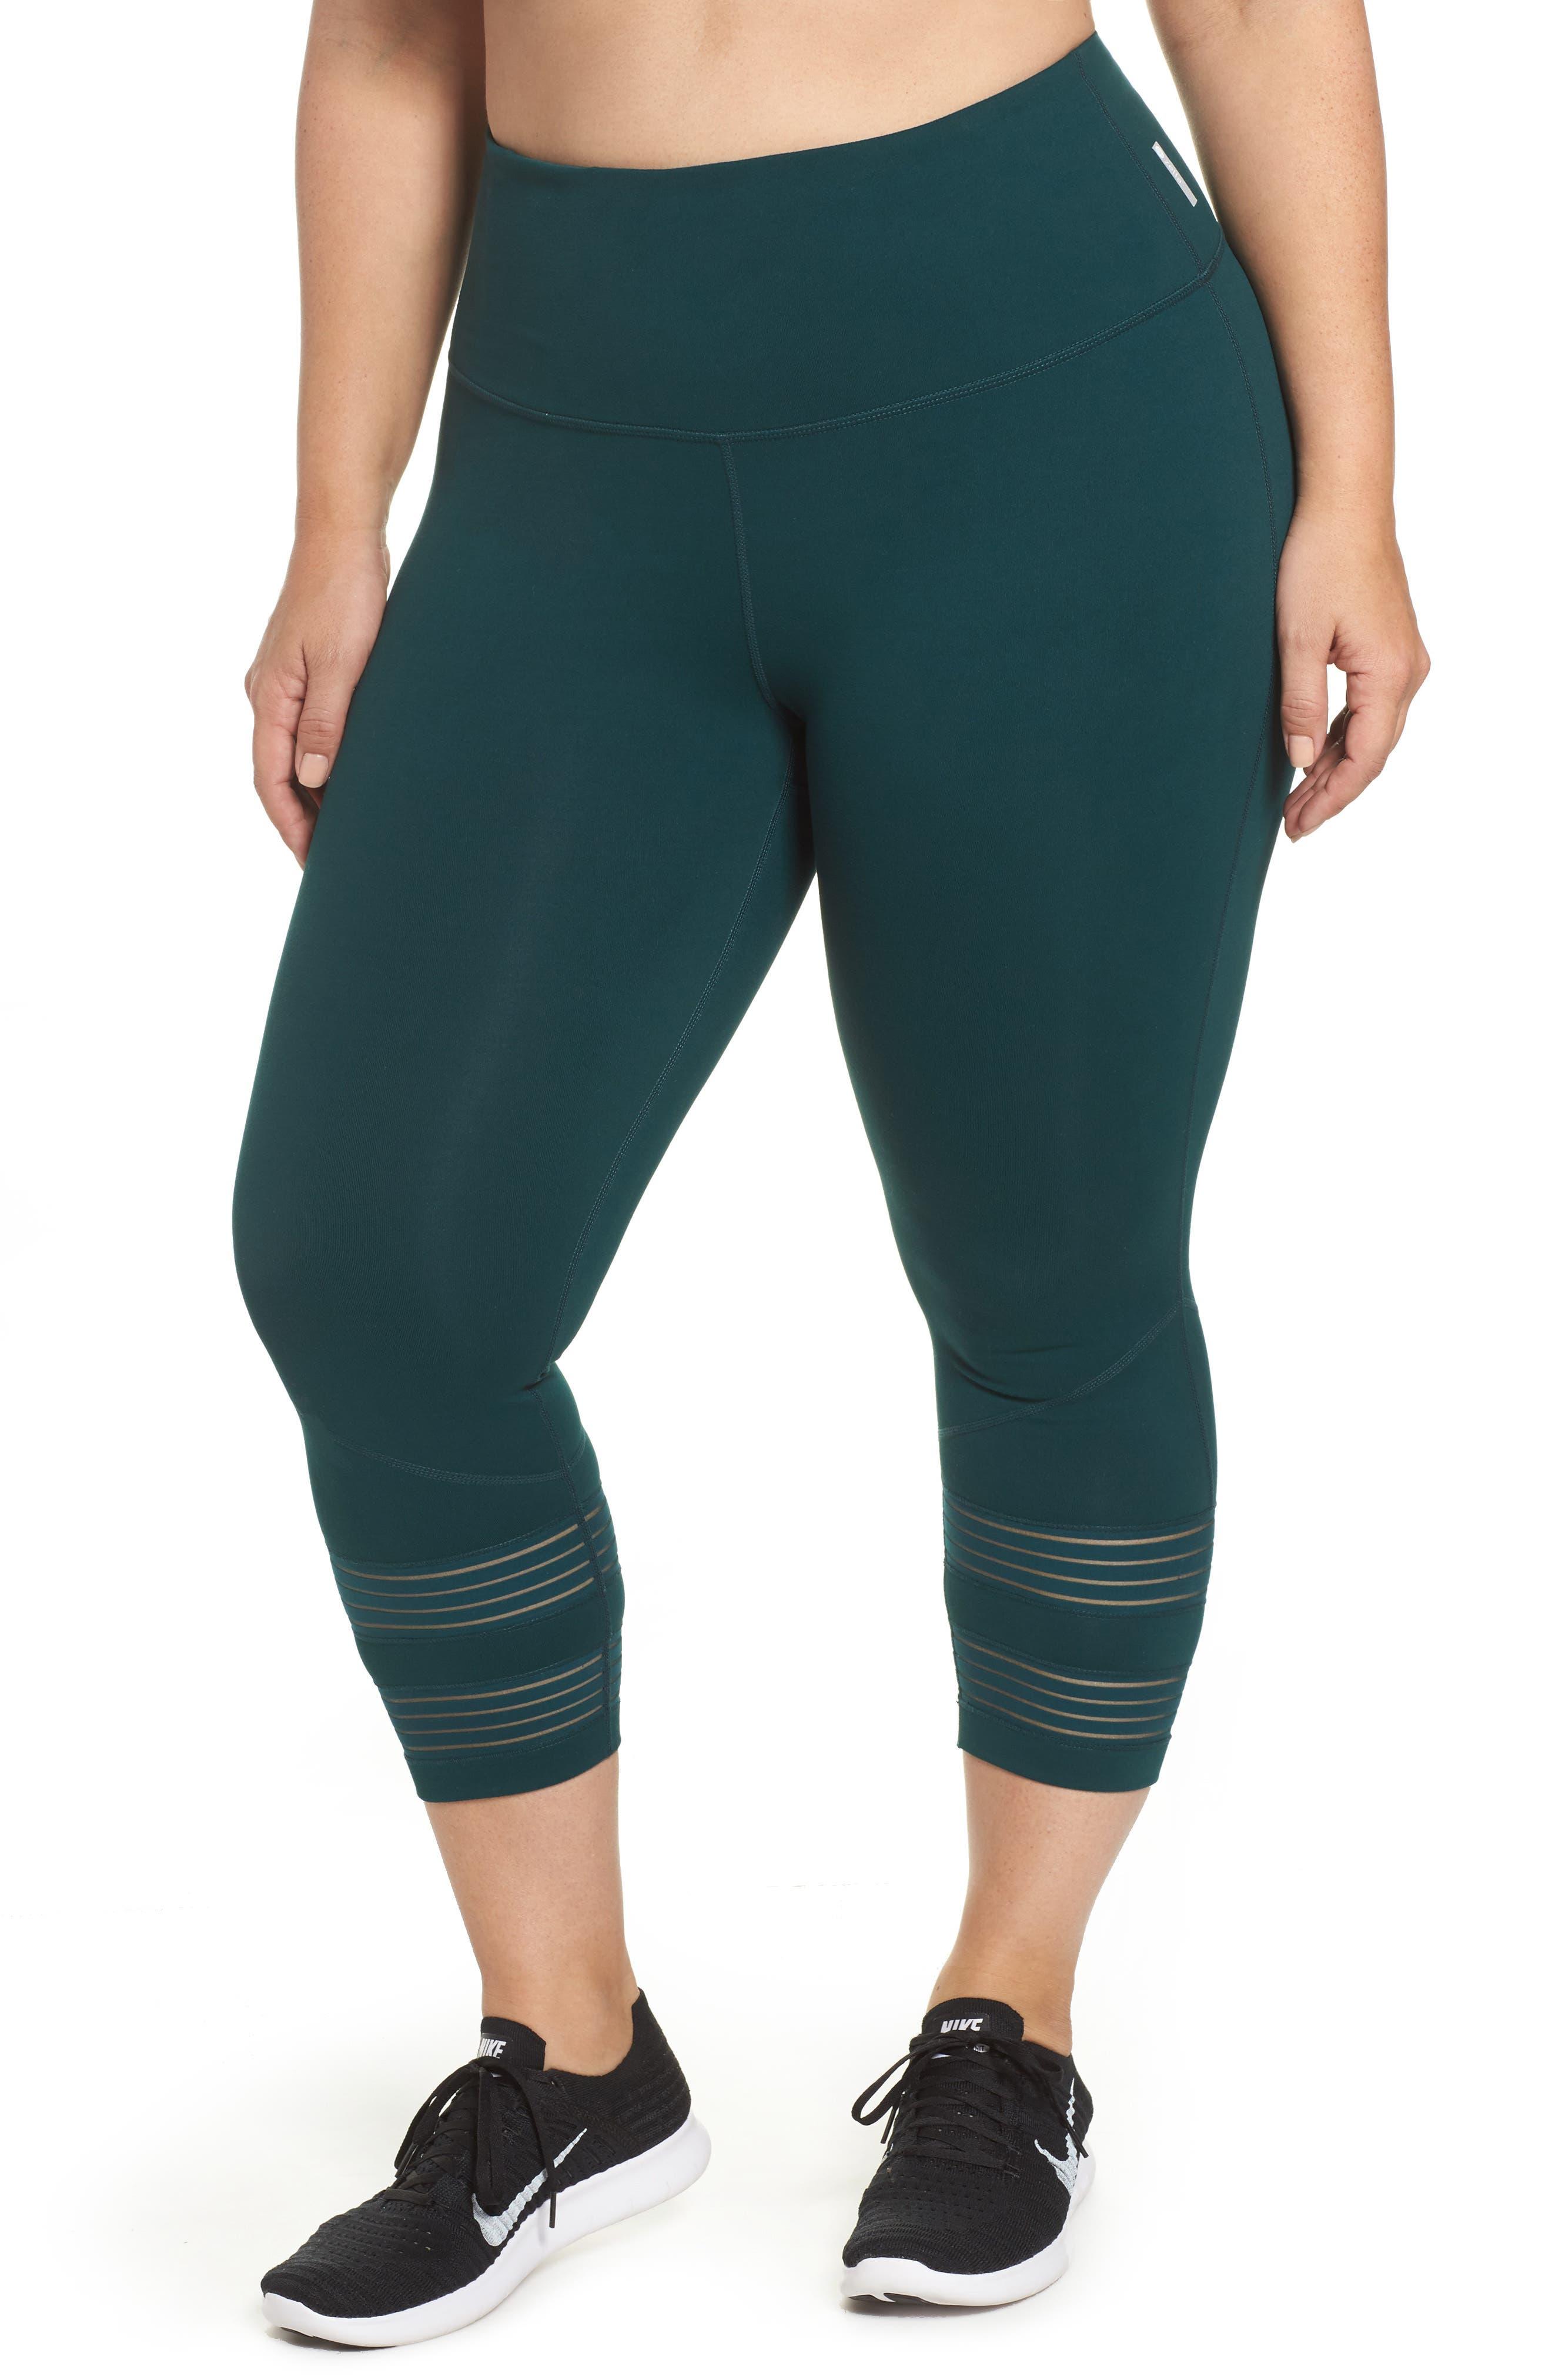 Twin High Waist Crop Leggings,                         Main,                         color, Green Ponderosa